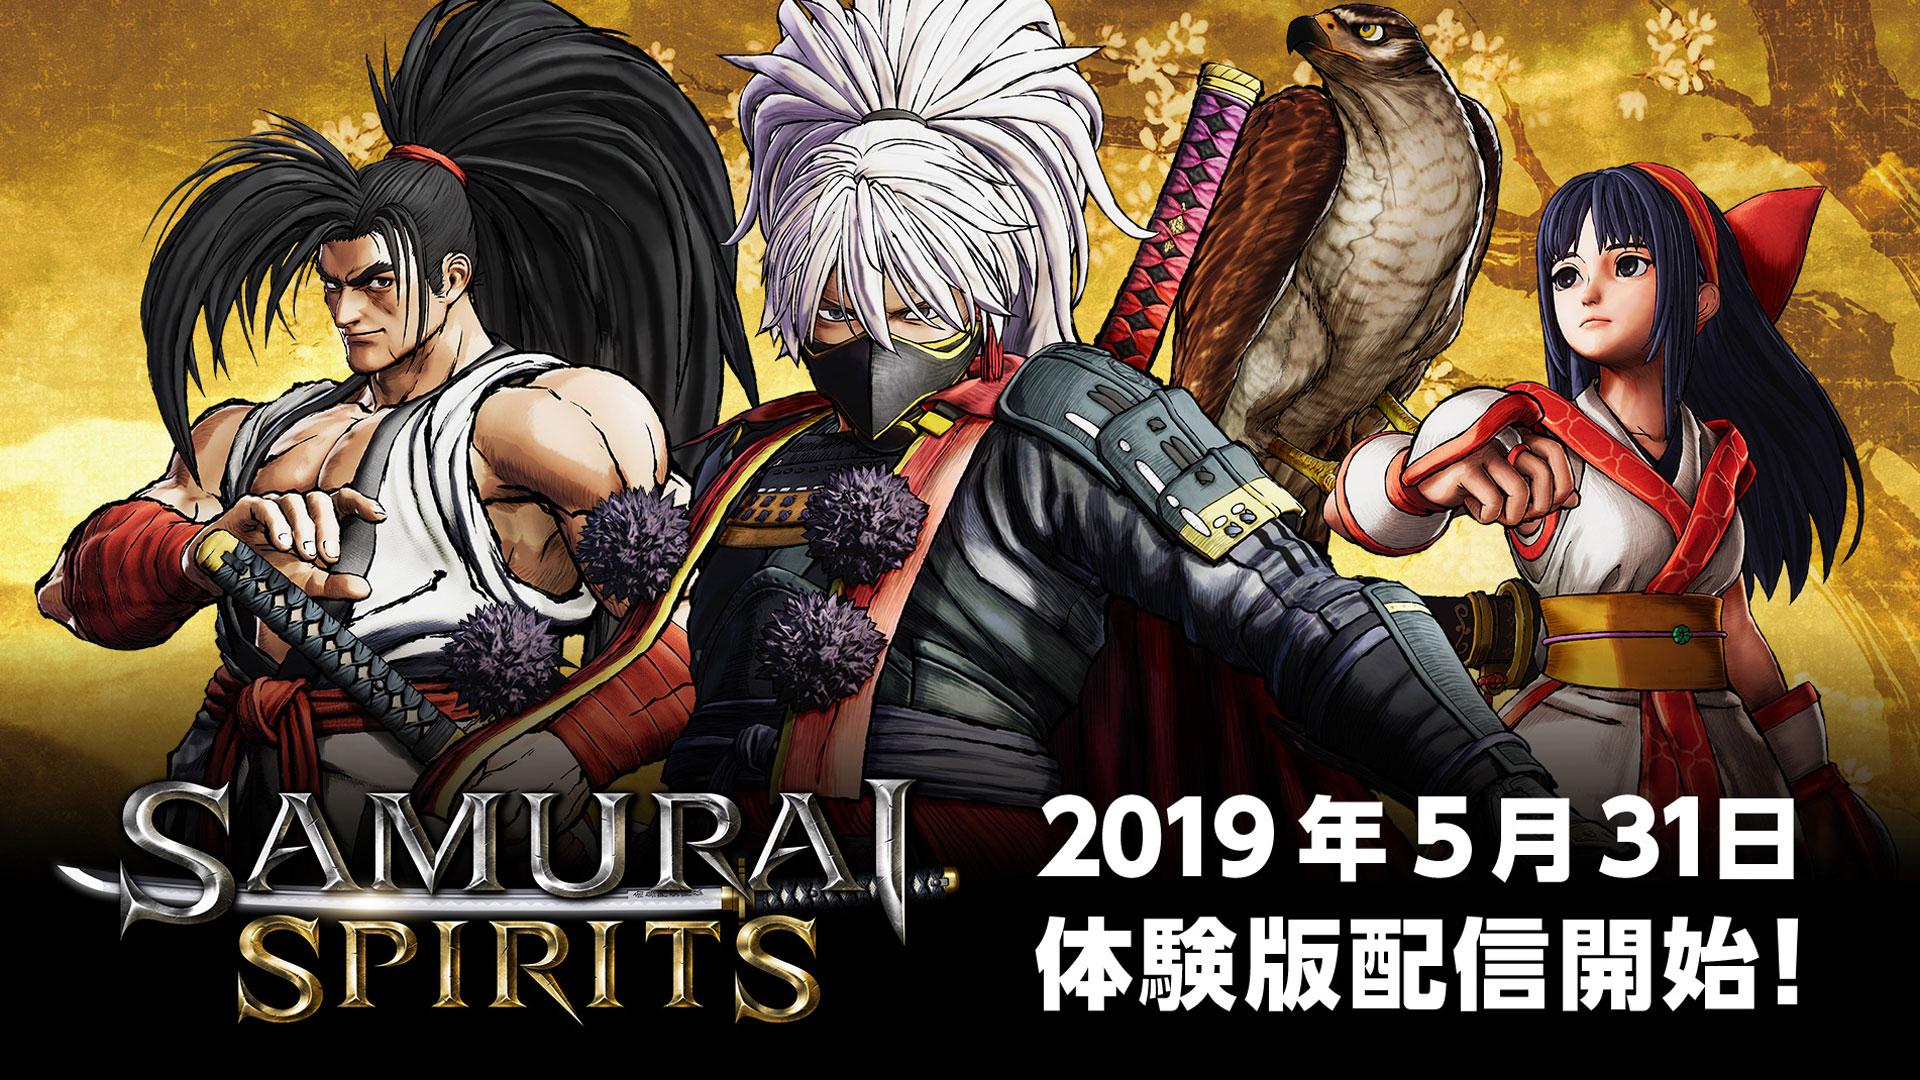 【『SAMURAI SPIRITS』体験版 5月31日に配信】他、新着トレンド5月30日